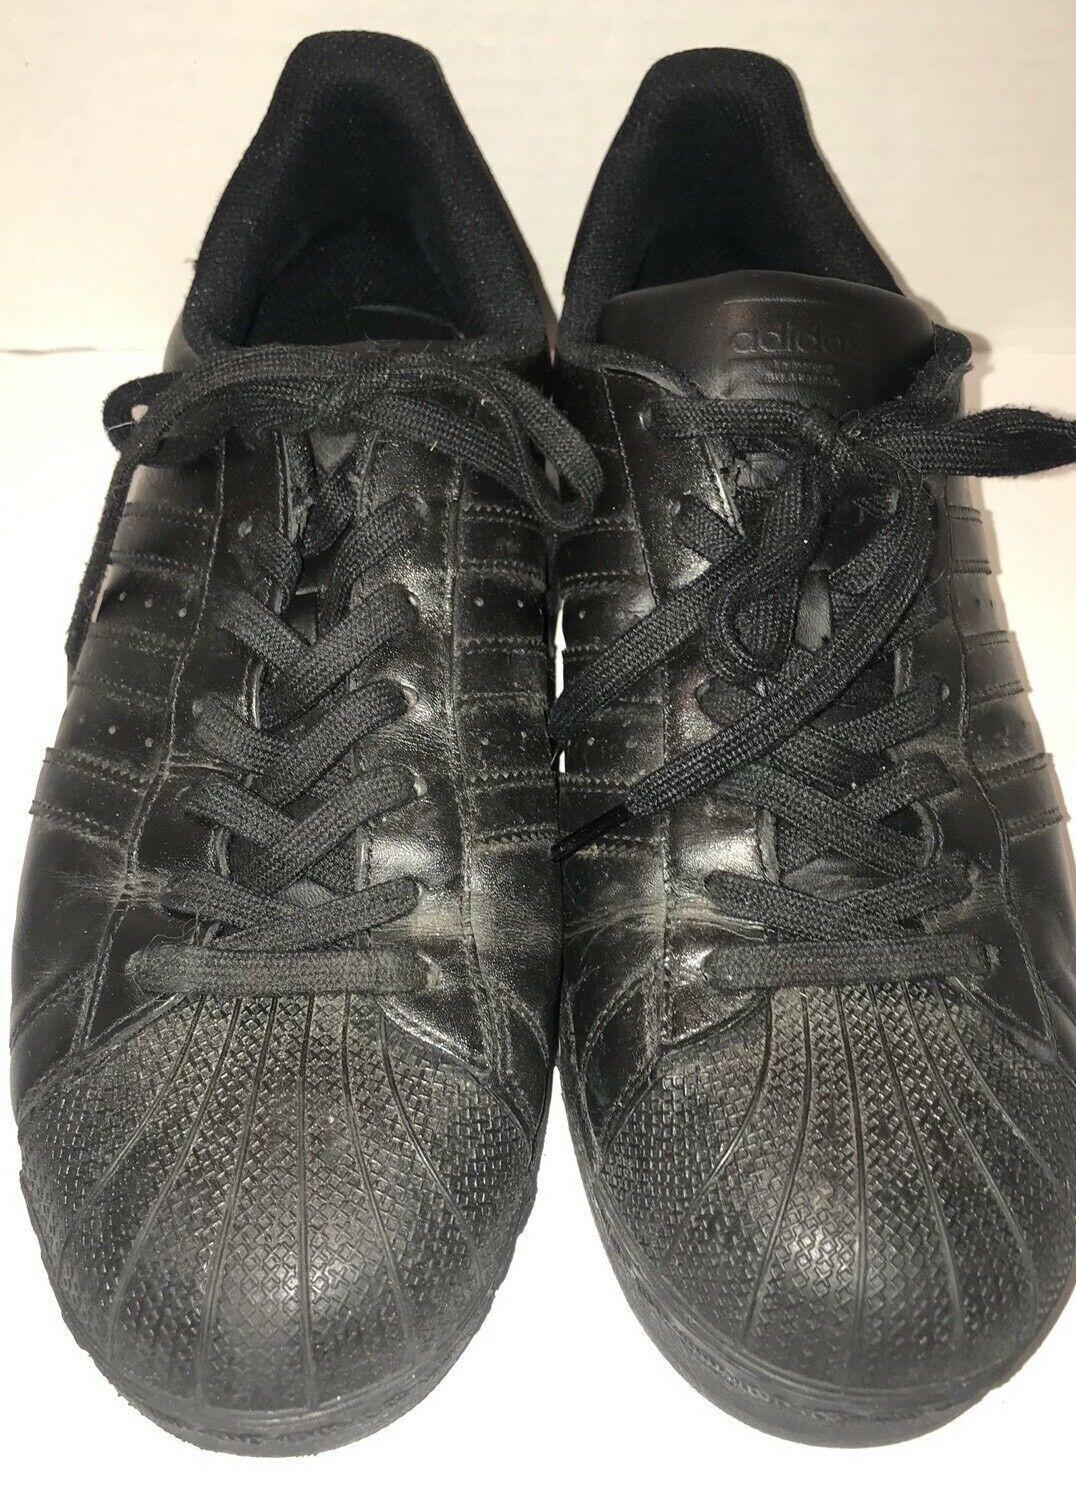 buy online 00f6d 85fd7 Adidas Superstar Shelltoe All Black 10.5 and 47 similar items. S l1600